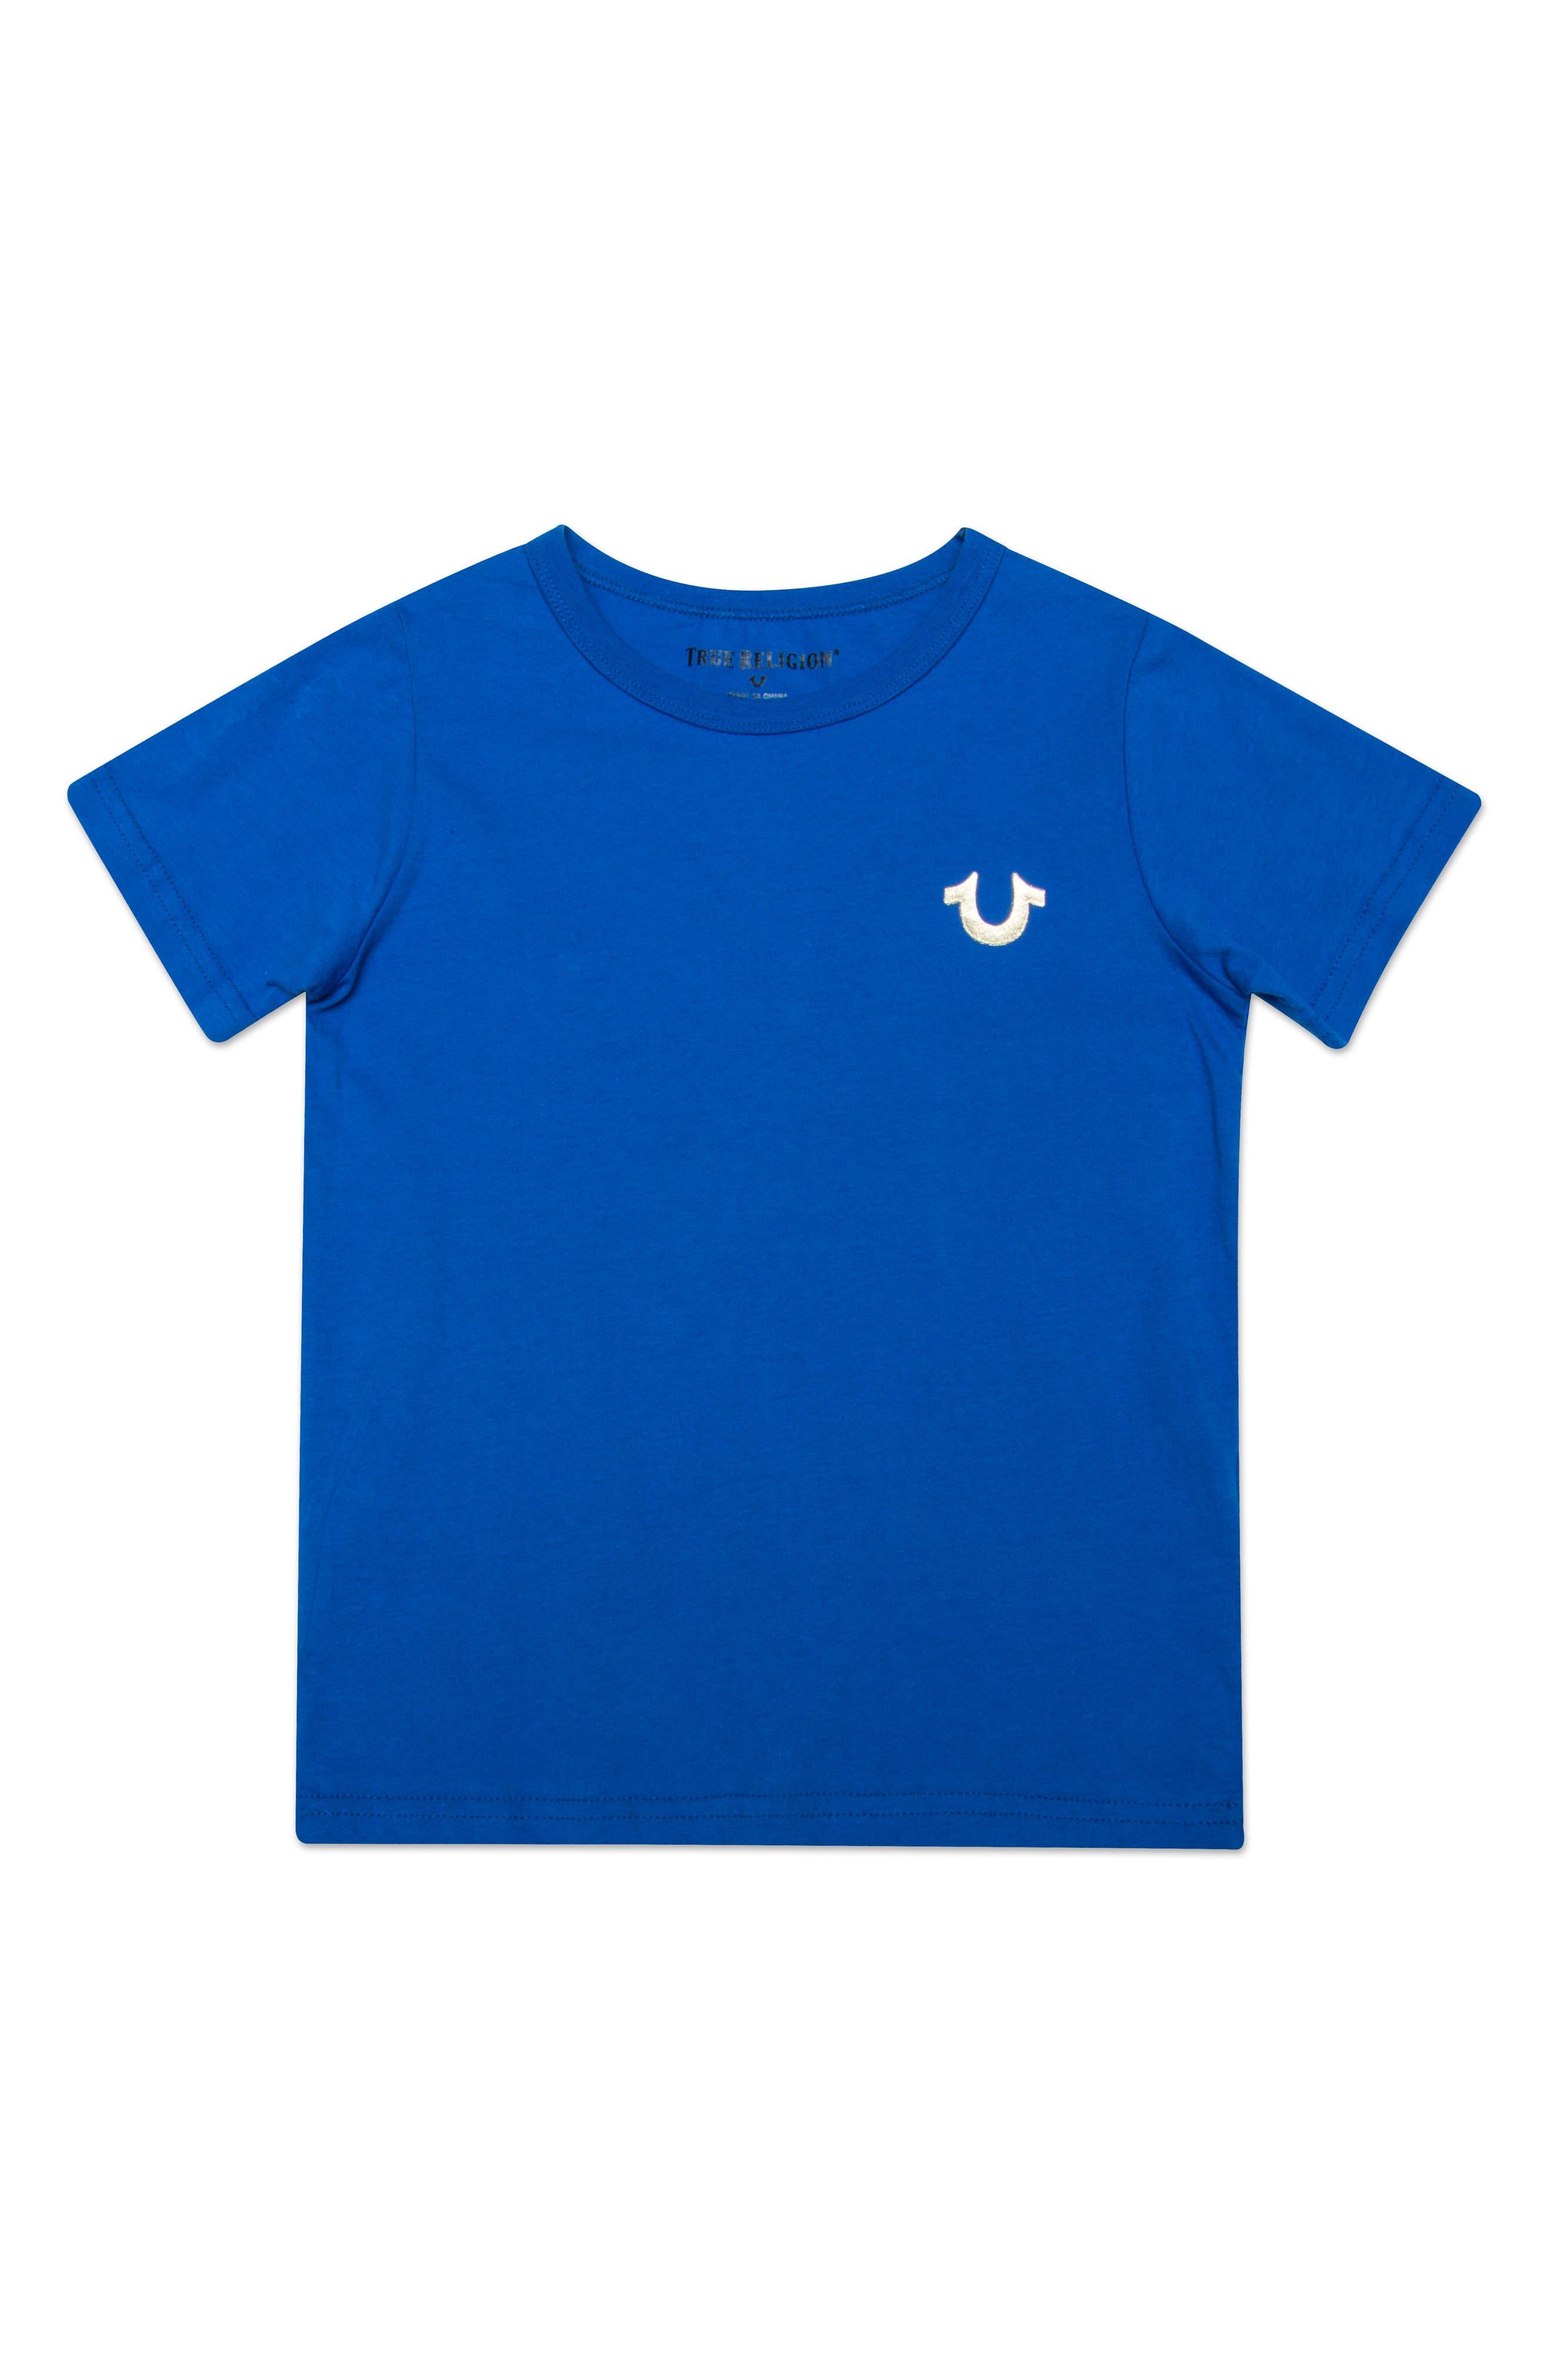 Alternate Image 1 Selected - True Religion Brand Jeans Gold Buddha Logo T-Shirt (Toddler Boys, Little Boys & Big Boys)